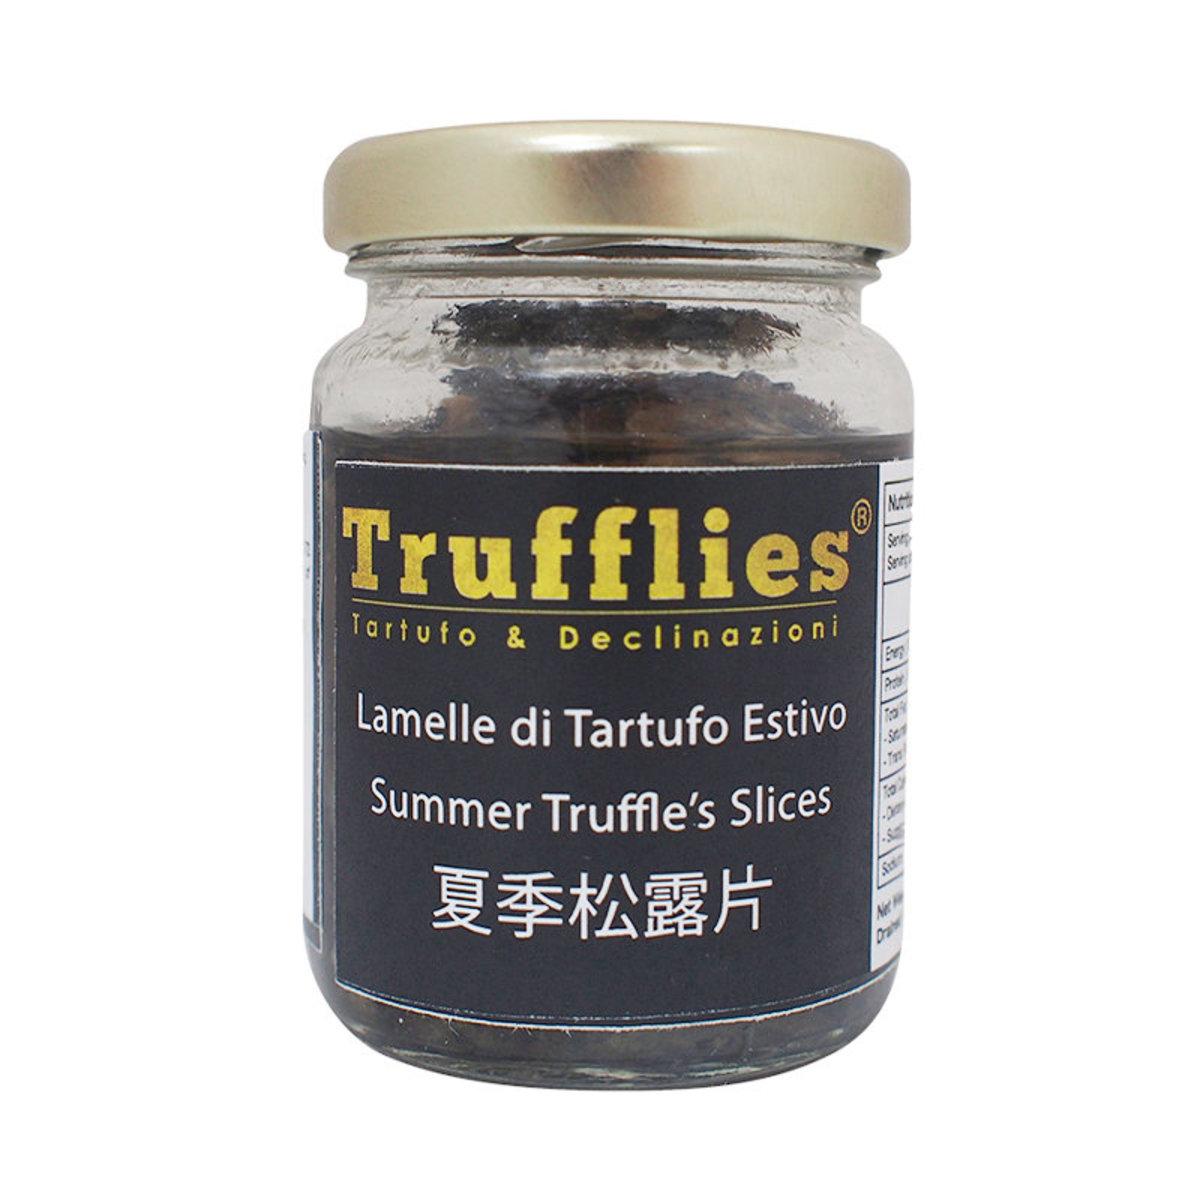 Trufflies 夏季松露片 80g